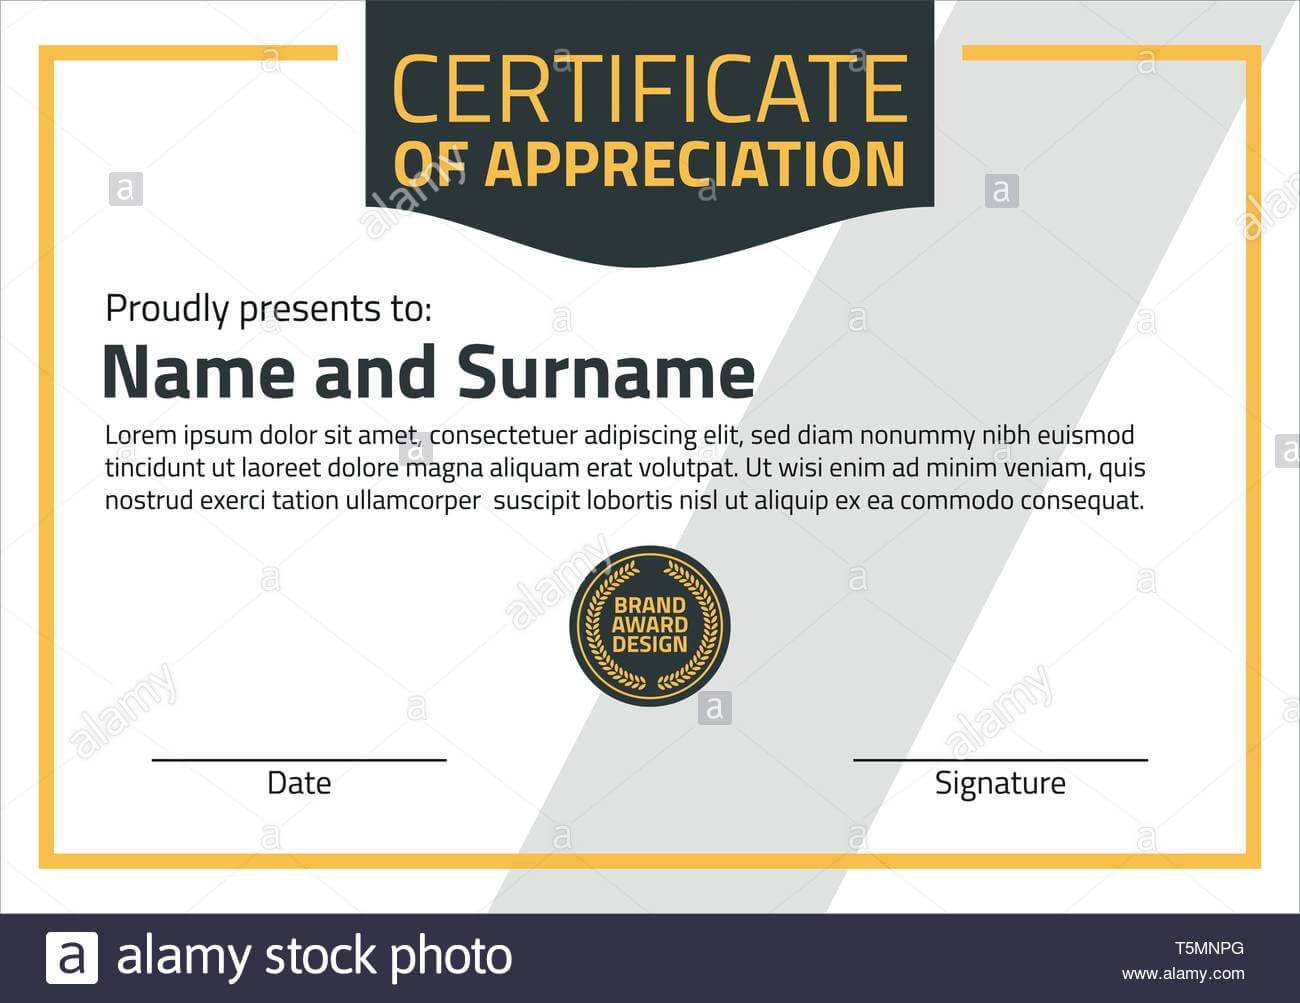 Vector Certificate Template. Illustration Certificate In A4 inside Certificate Template Size